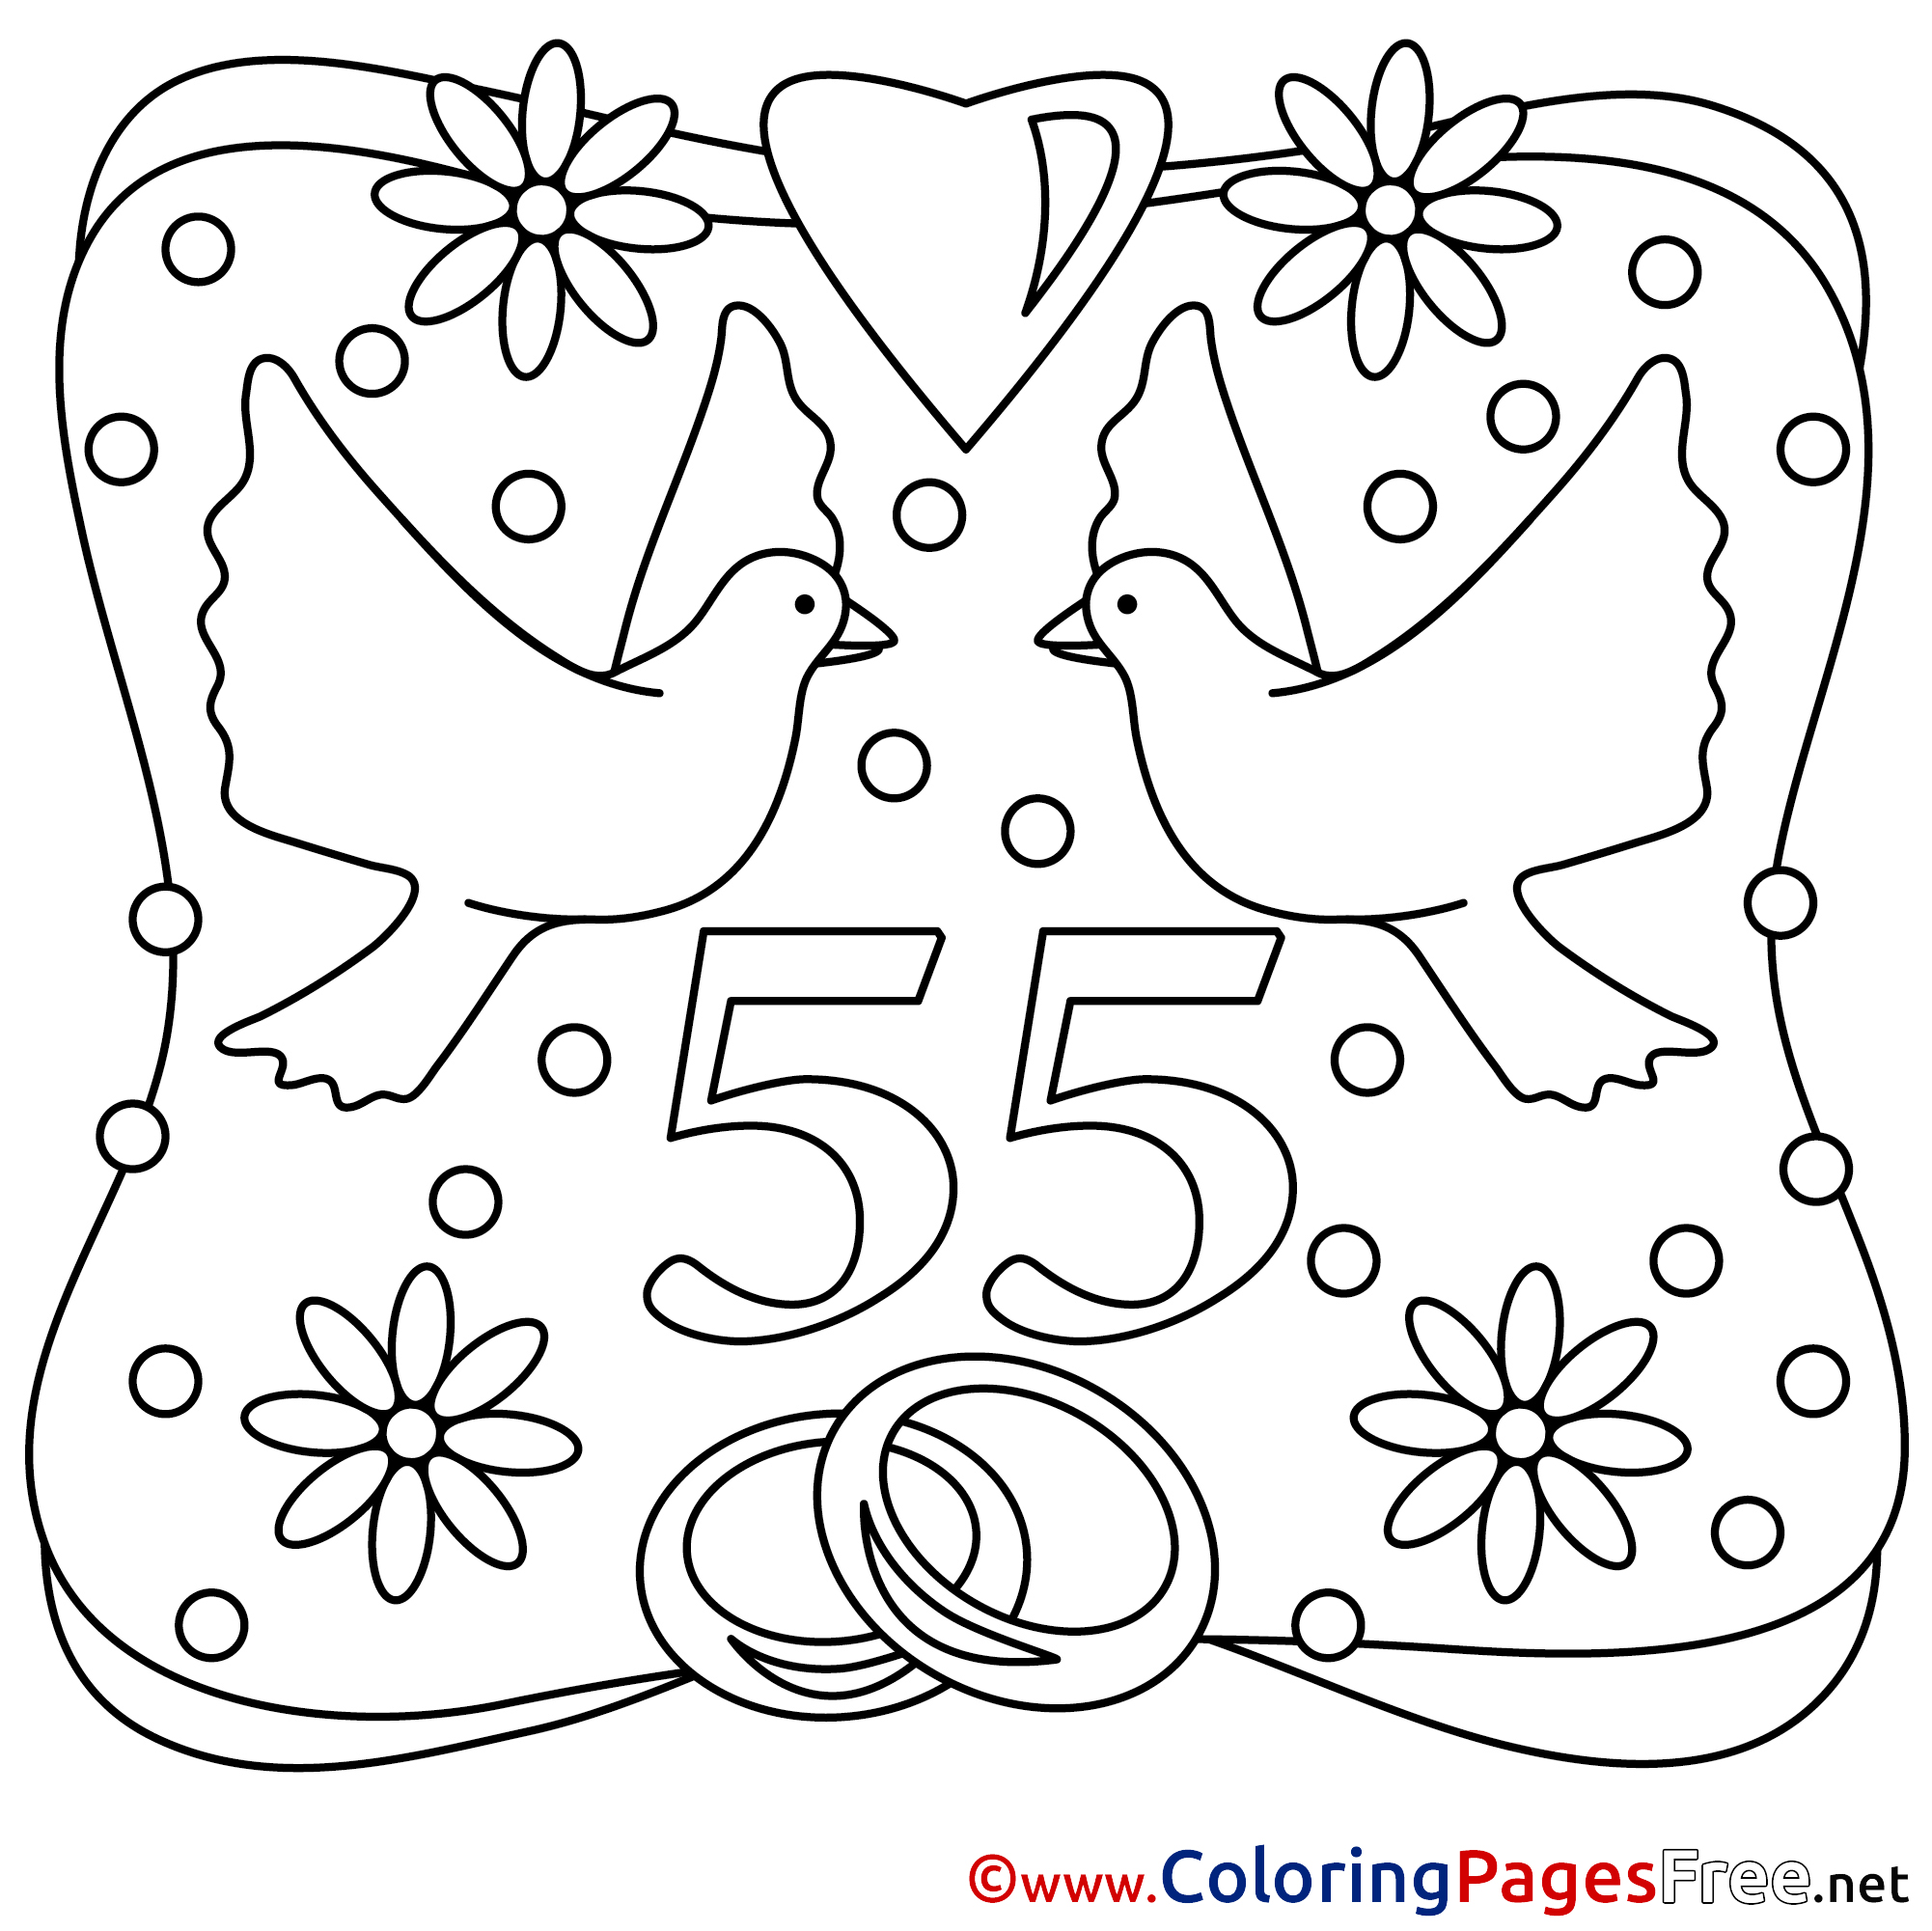 Printable coloring sheets wedding - Printable Coloring Sheets Wedding 50